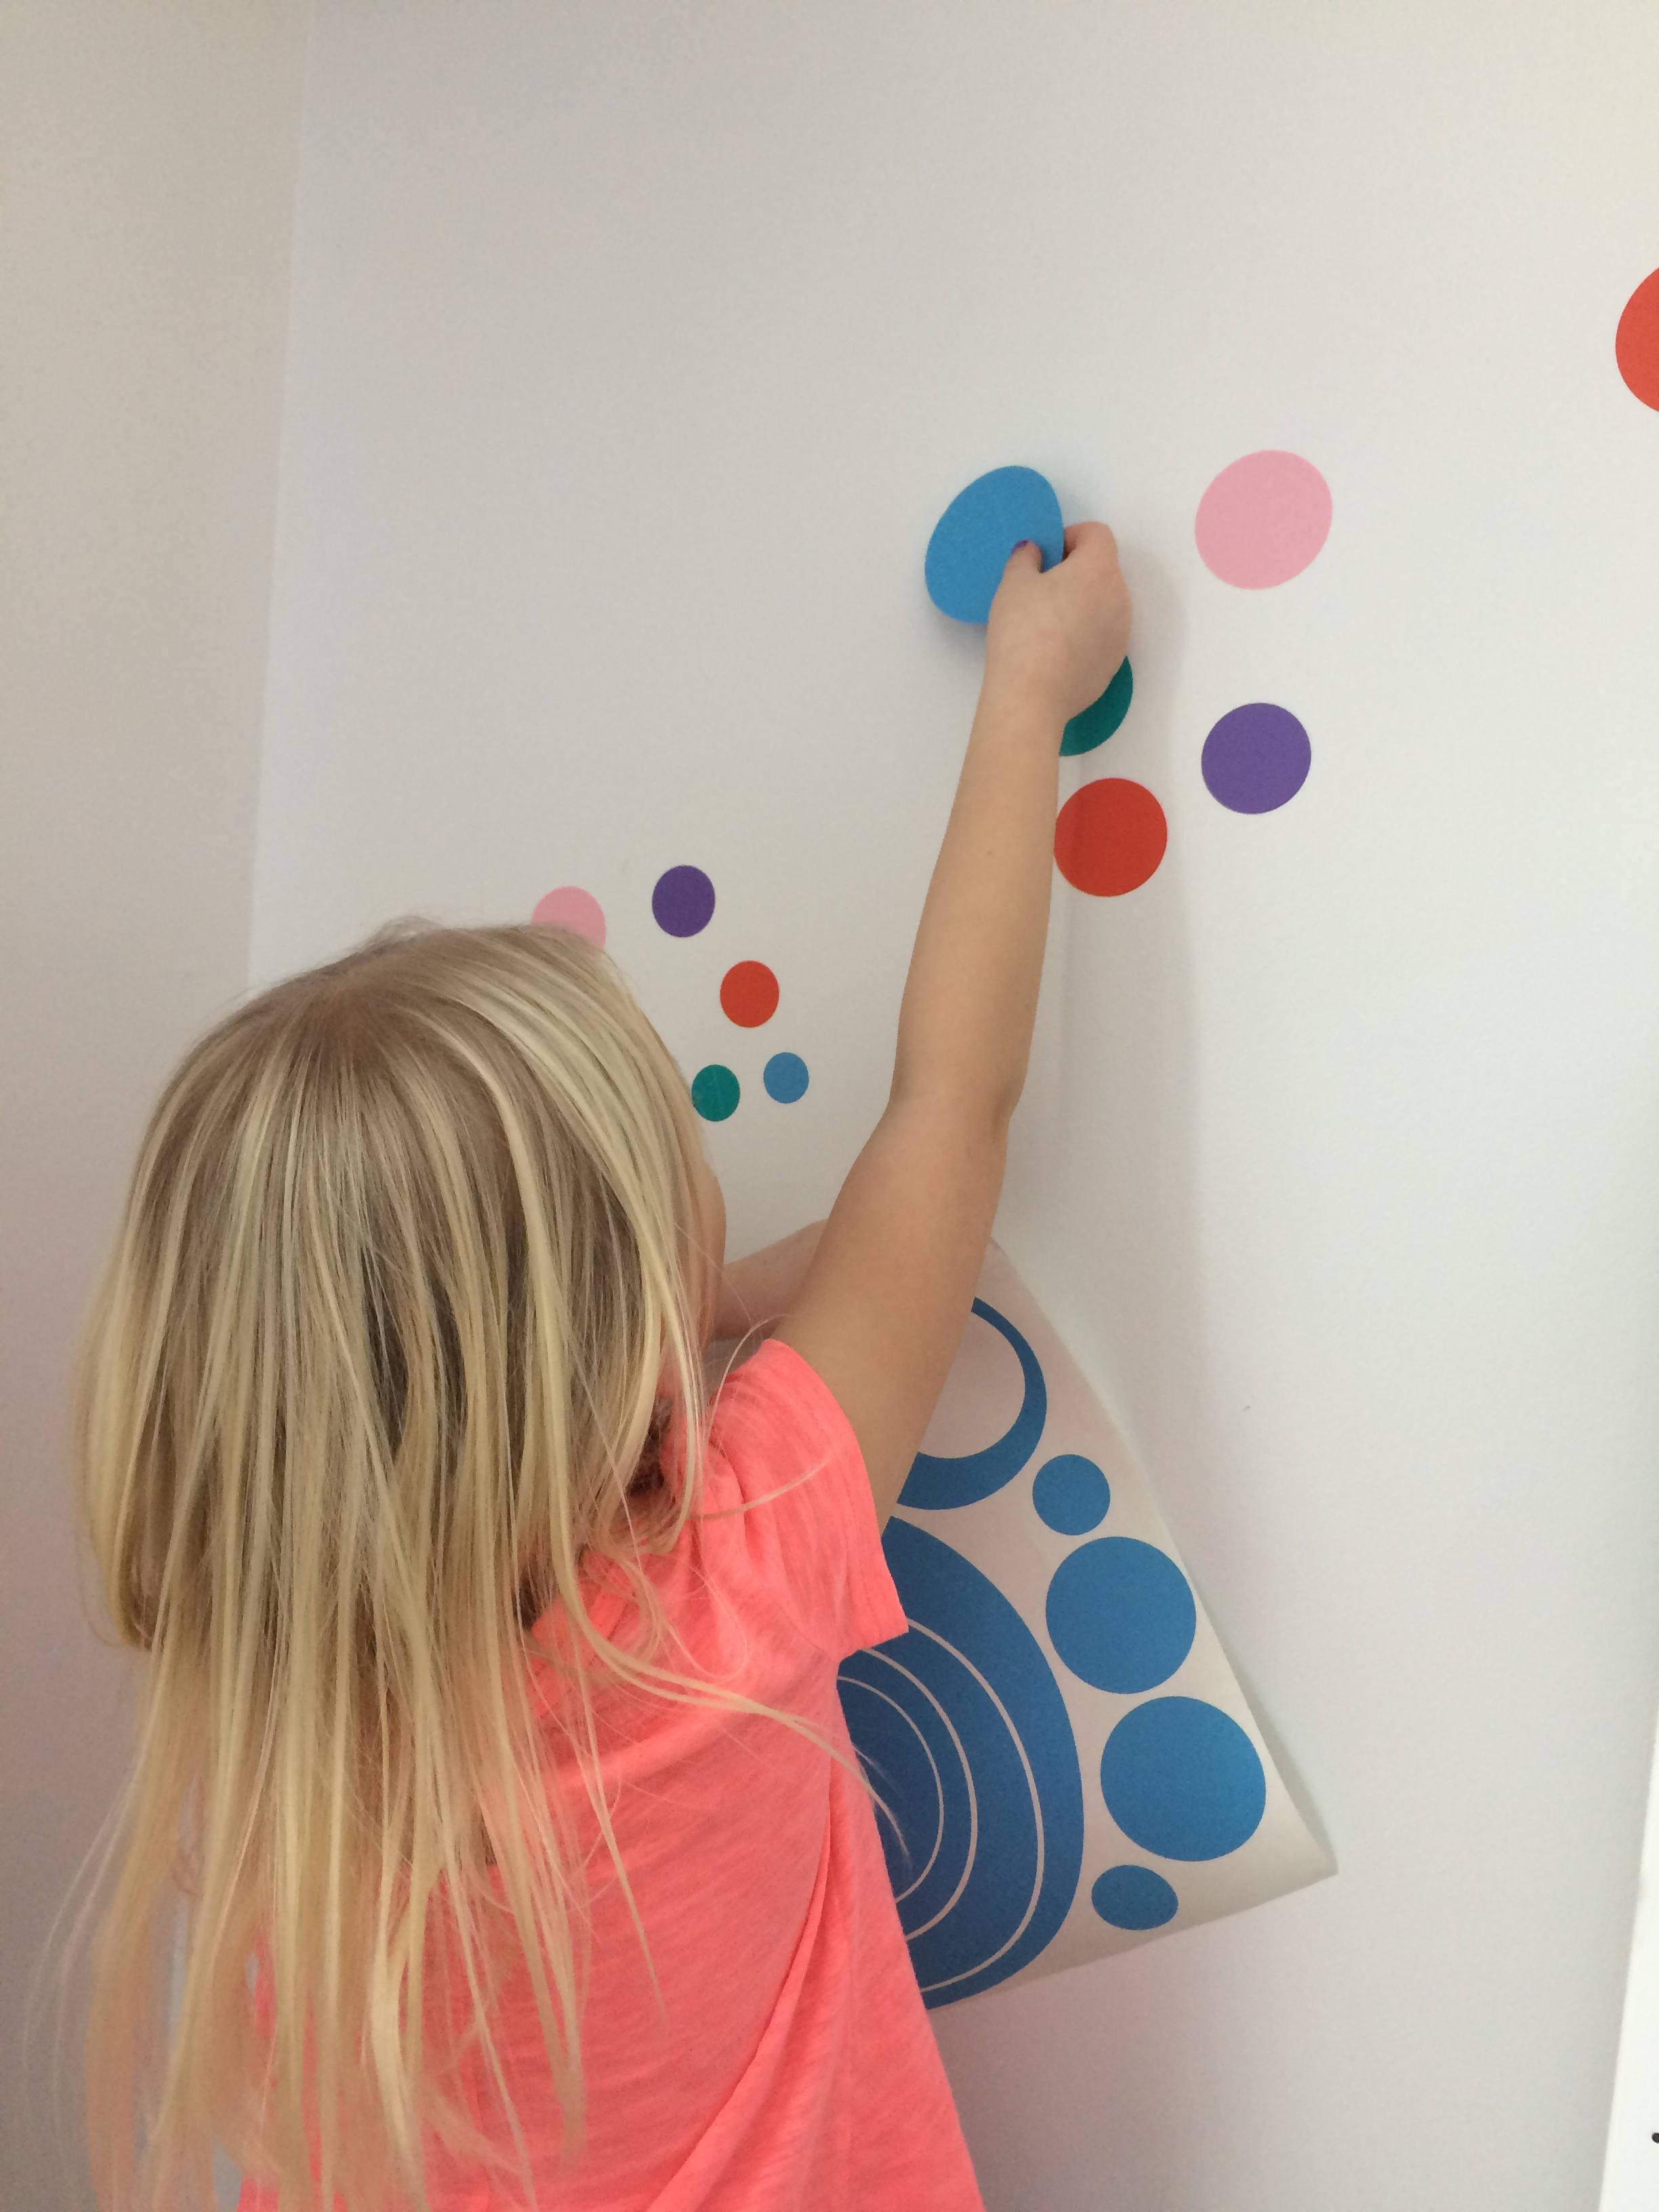 peel-n-stick-3-inch-variety-dots-children-apply-3-.jpg